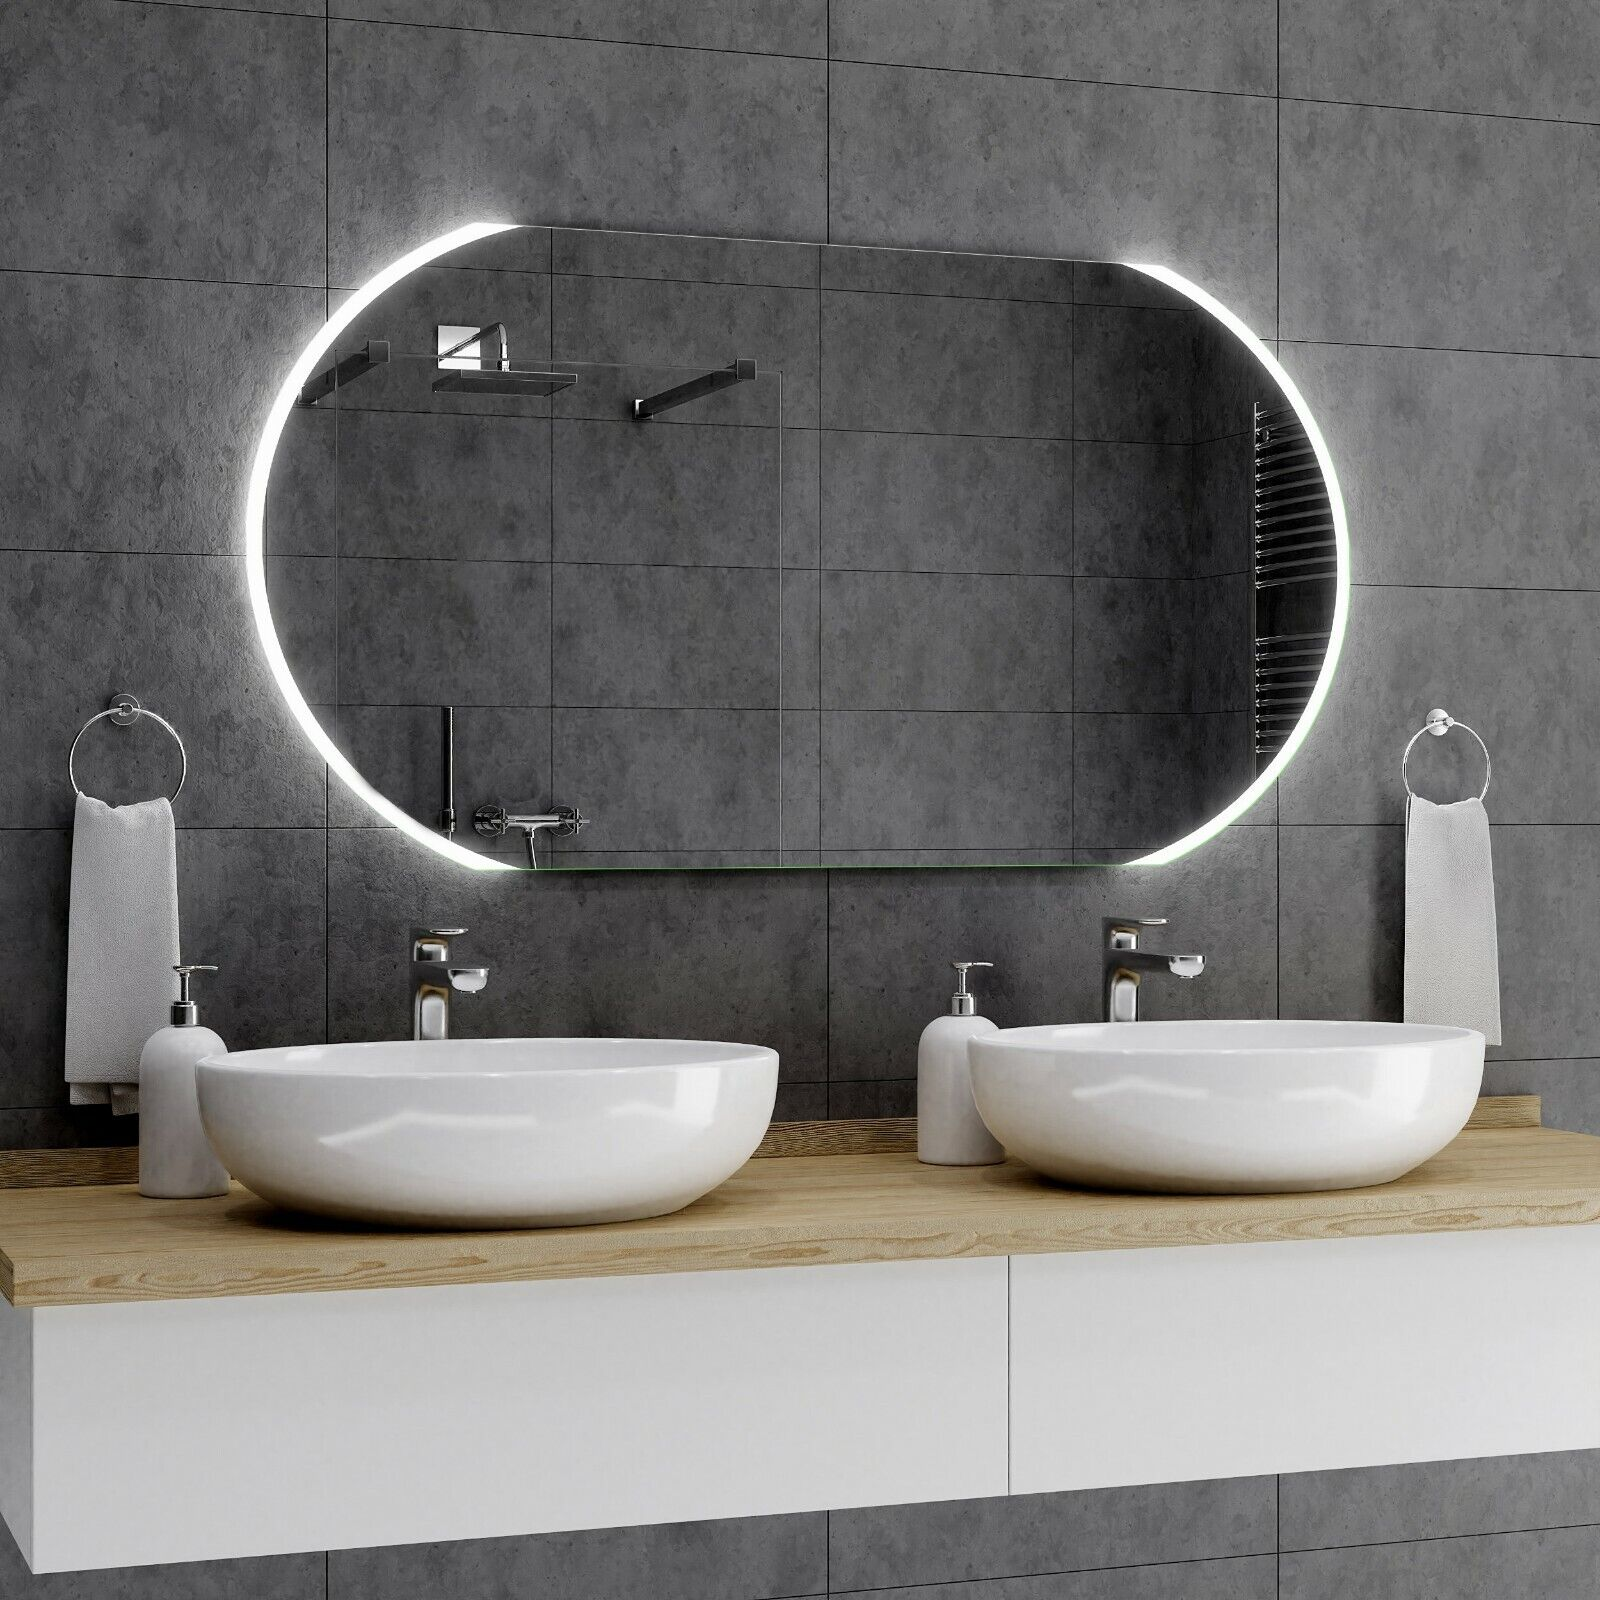 BALTIMORE Badspiegel mit LED Beleuchtung Wandspiegel Badezimmerspiegel  Maß A01